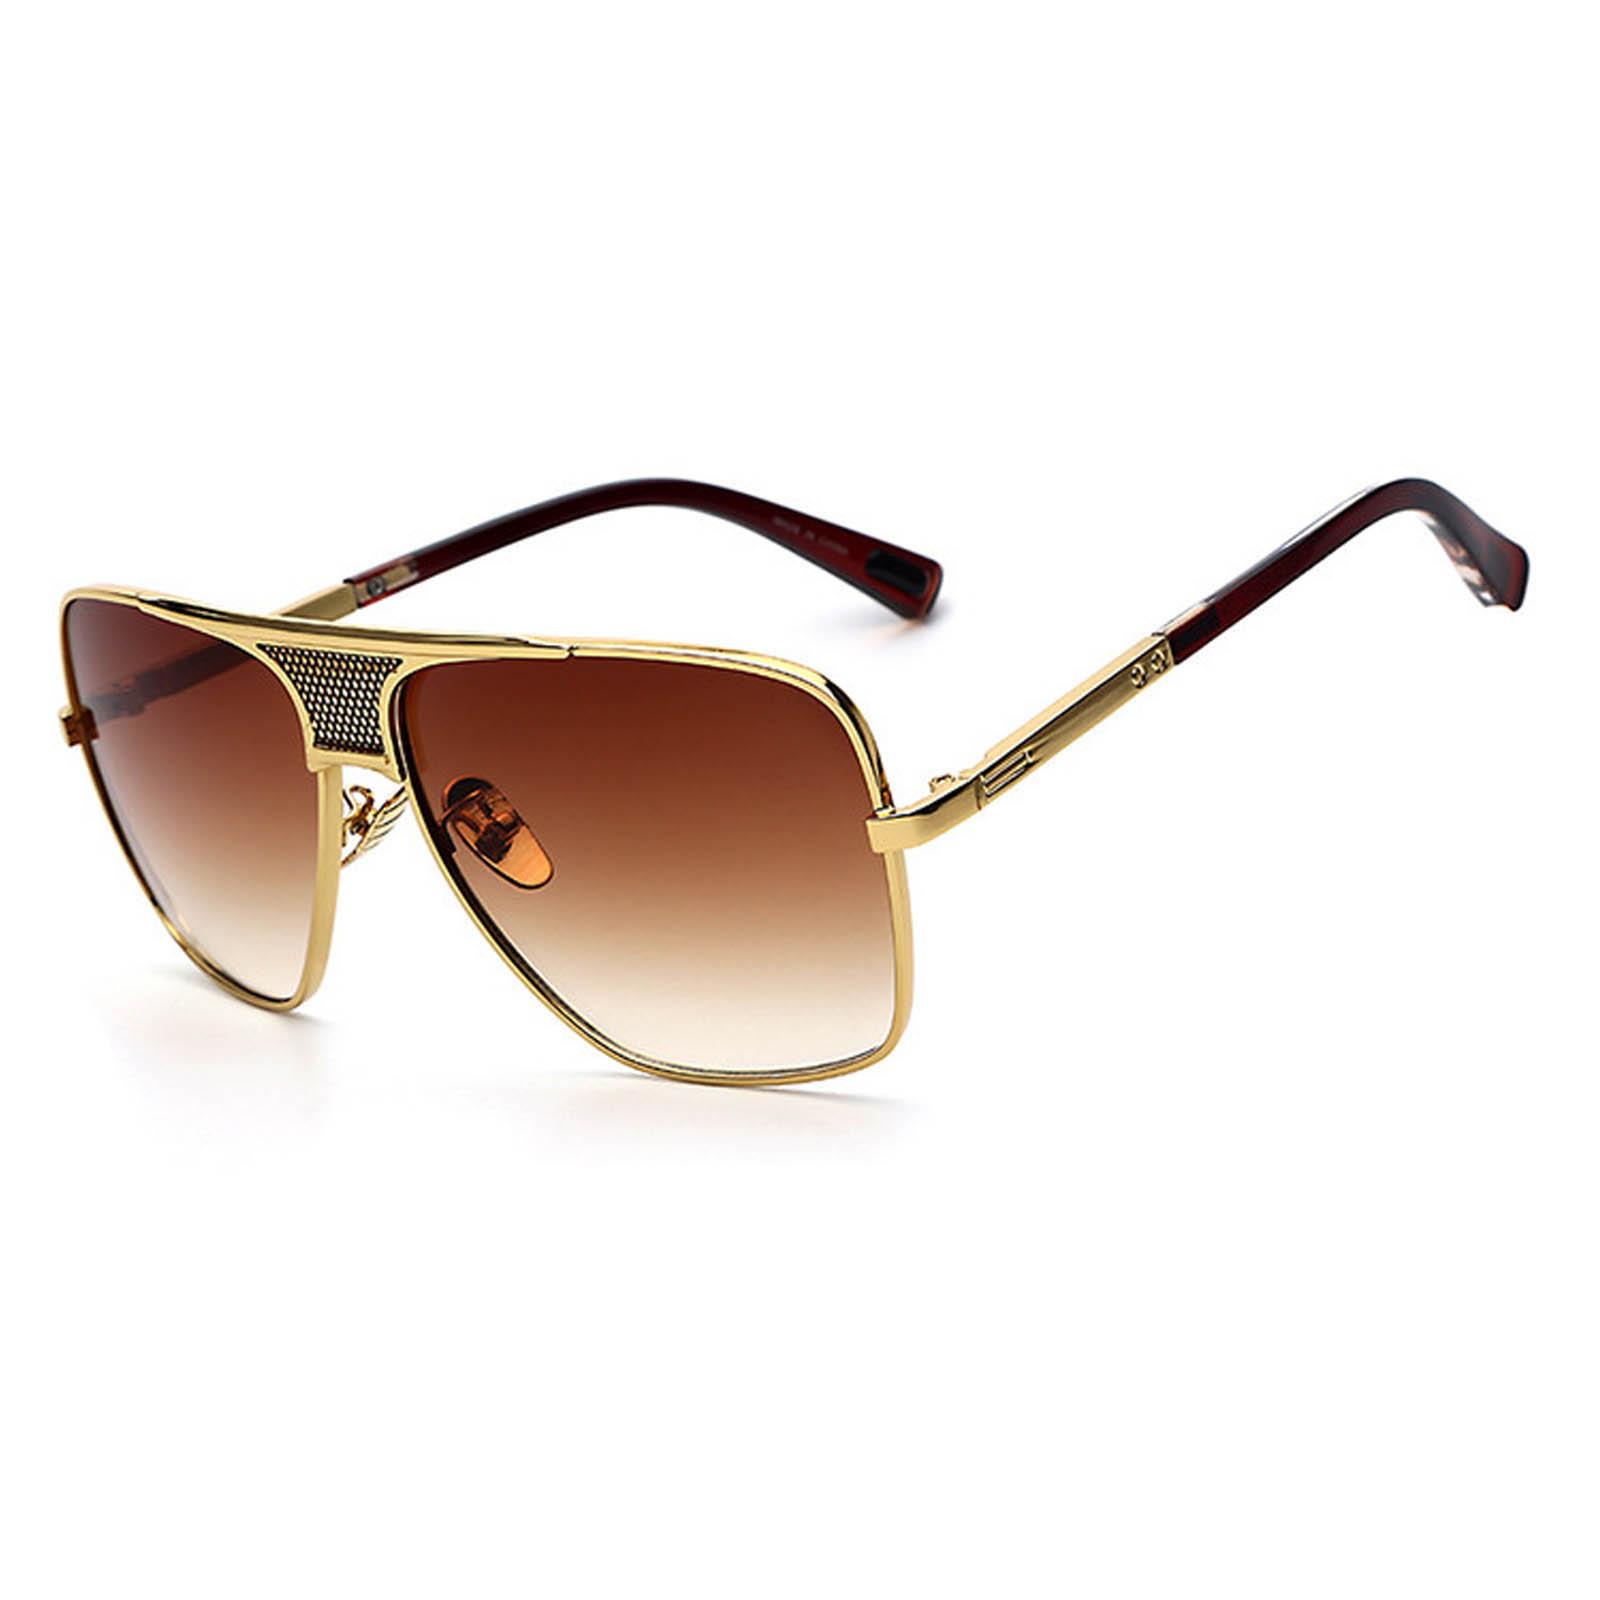 OWL ® 013 C3 Square Eyewear Sunglasses Women\'s Men\'s Metal Gold ...